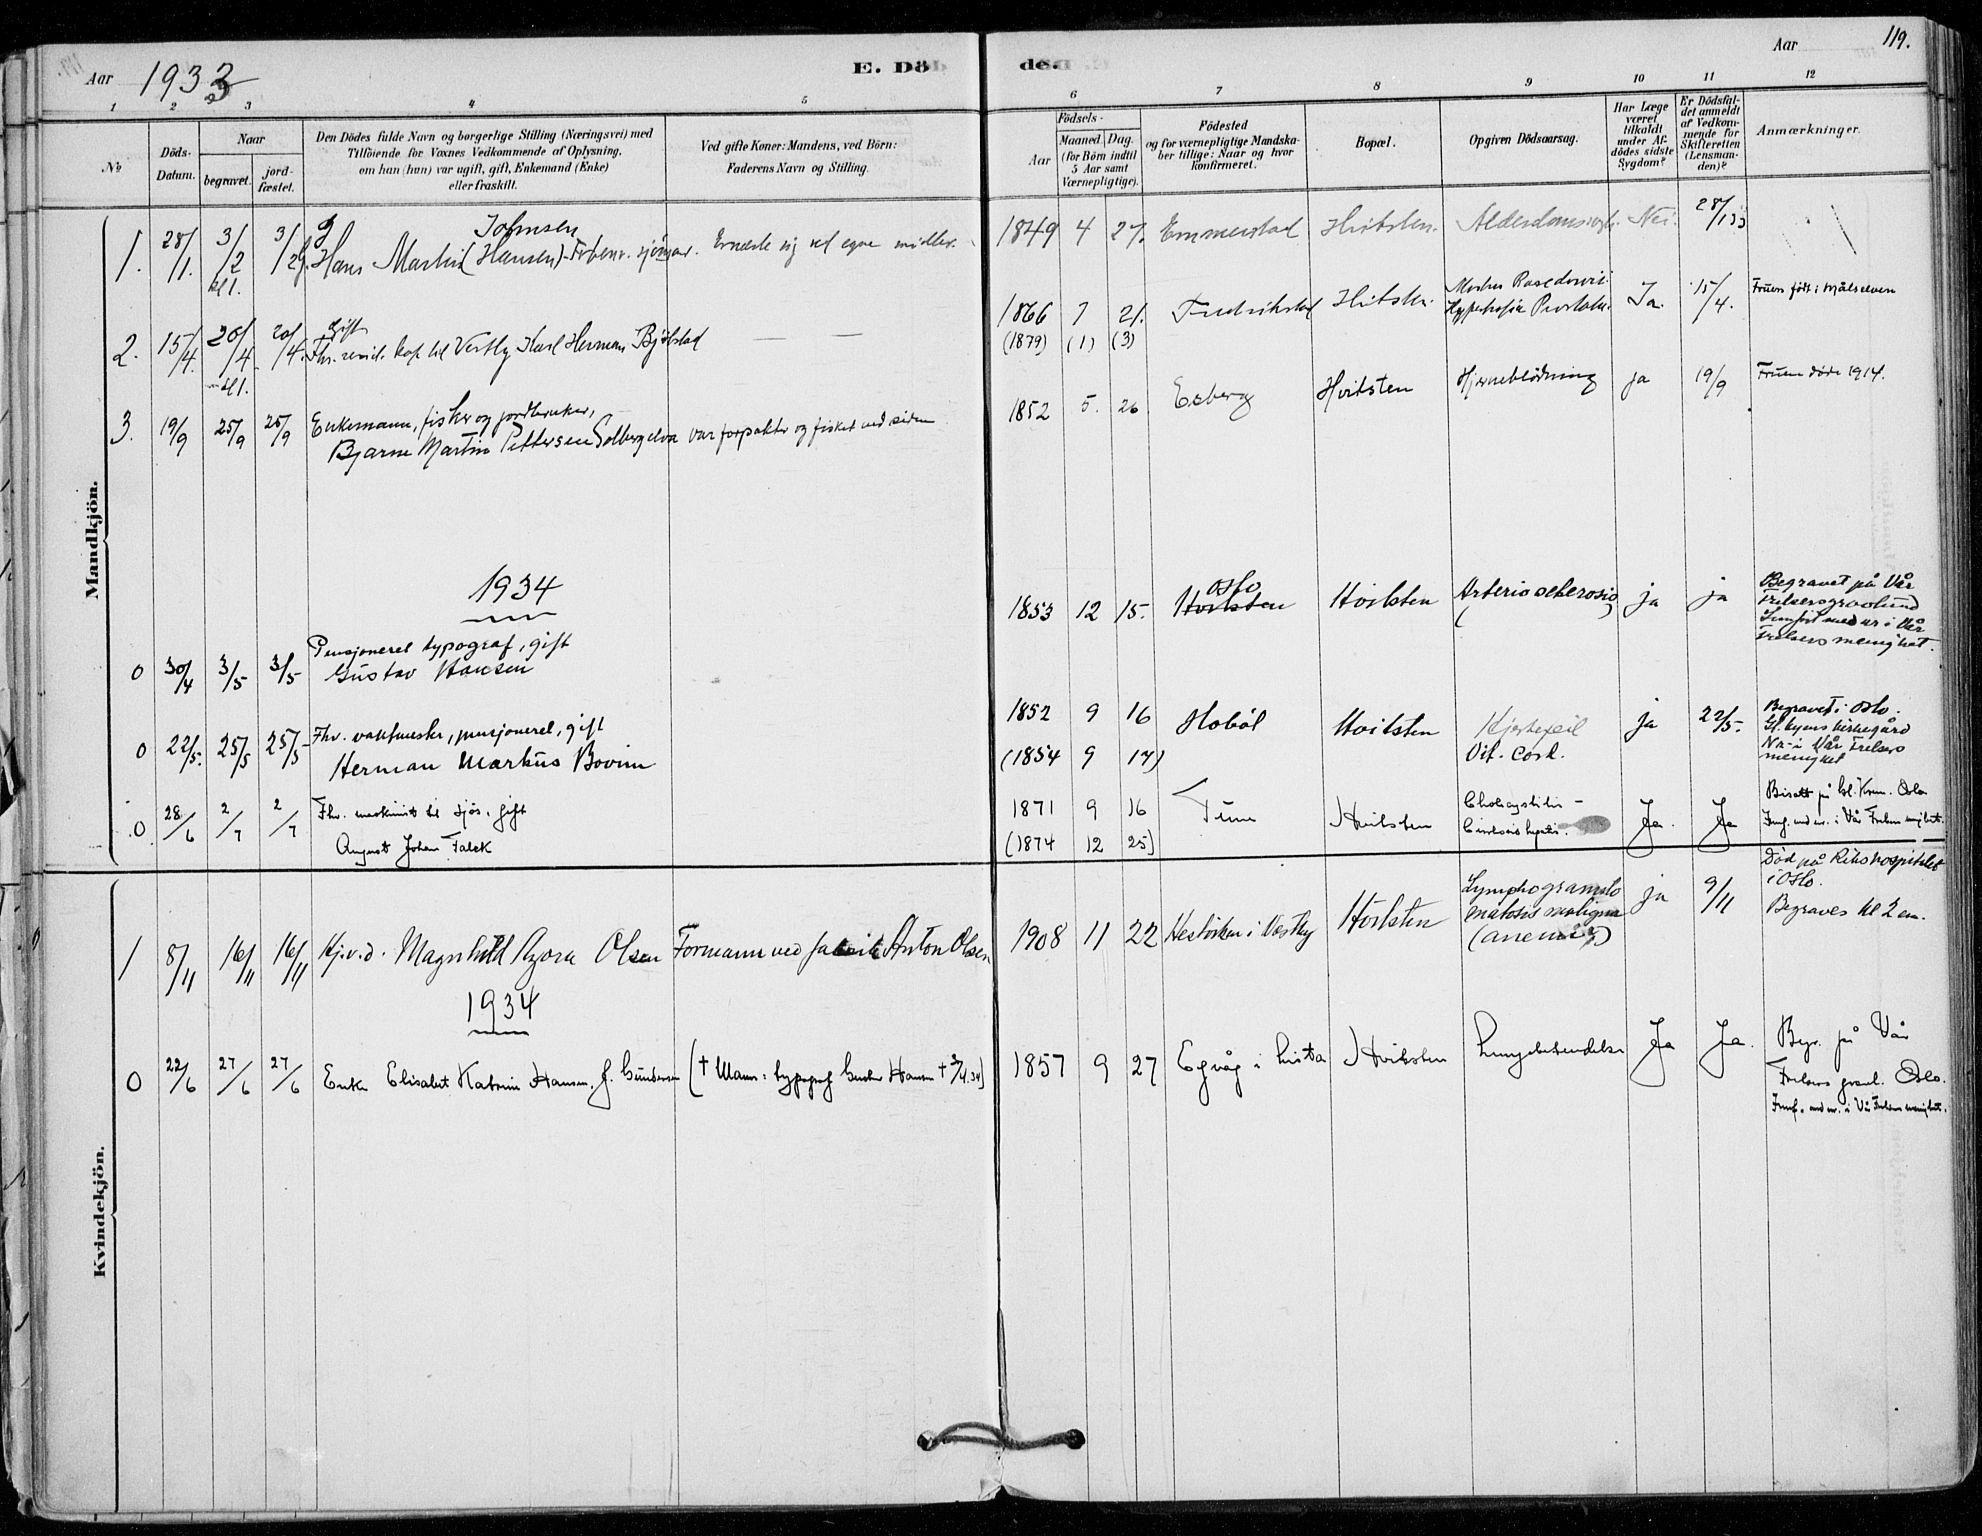 SAO, Vestby prestekontor Kirkebøker, F/Fd/L0001: Ministerialbok nr. IV 1, 1878-1945, s. 119